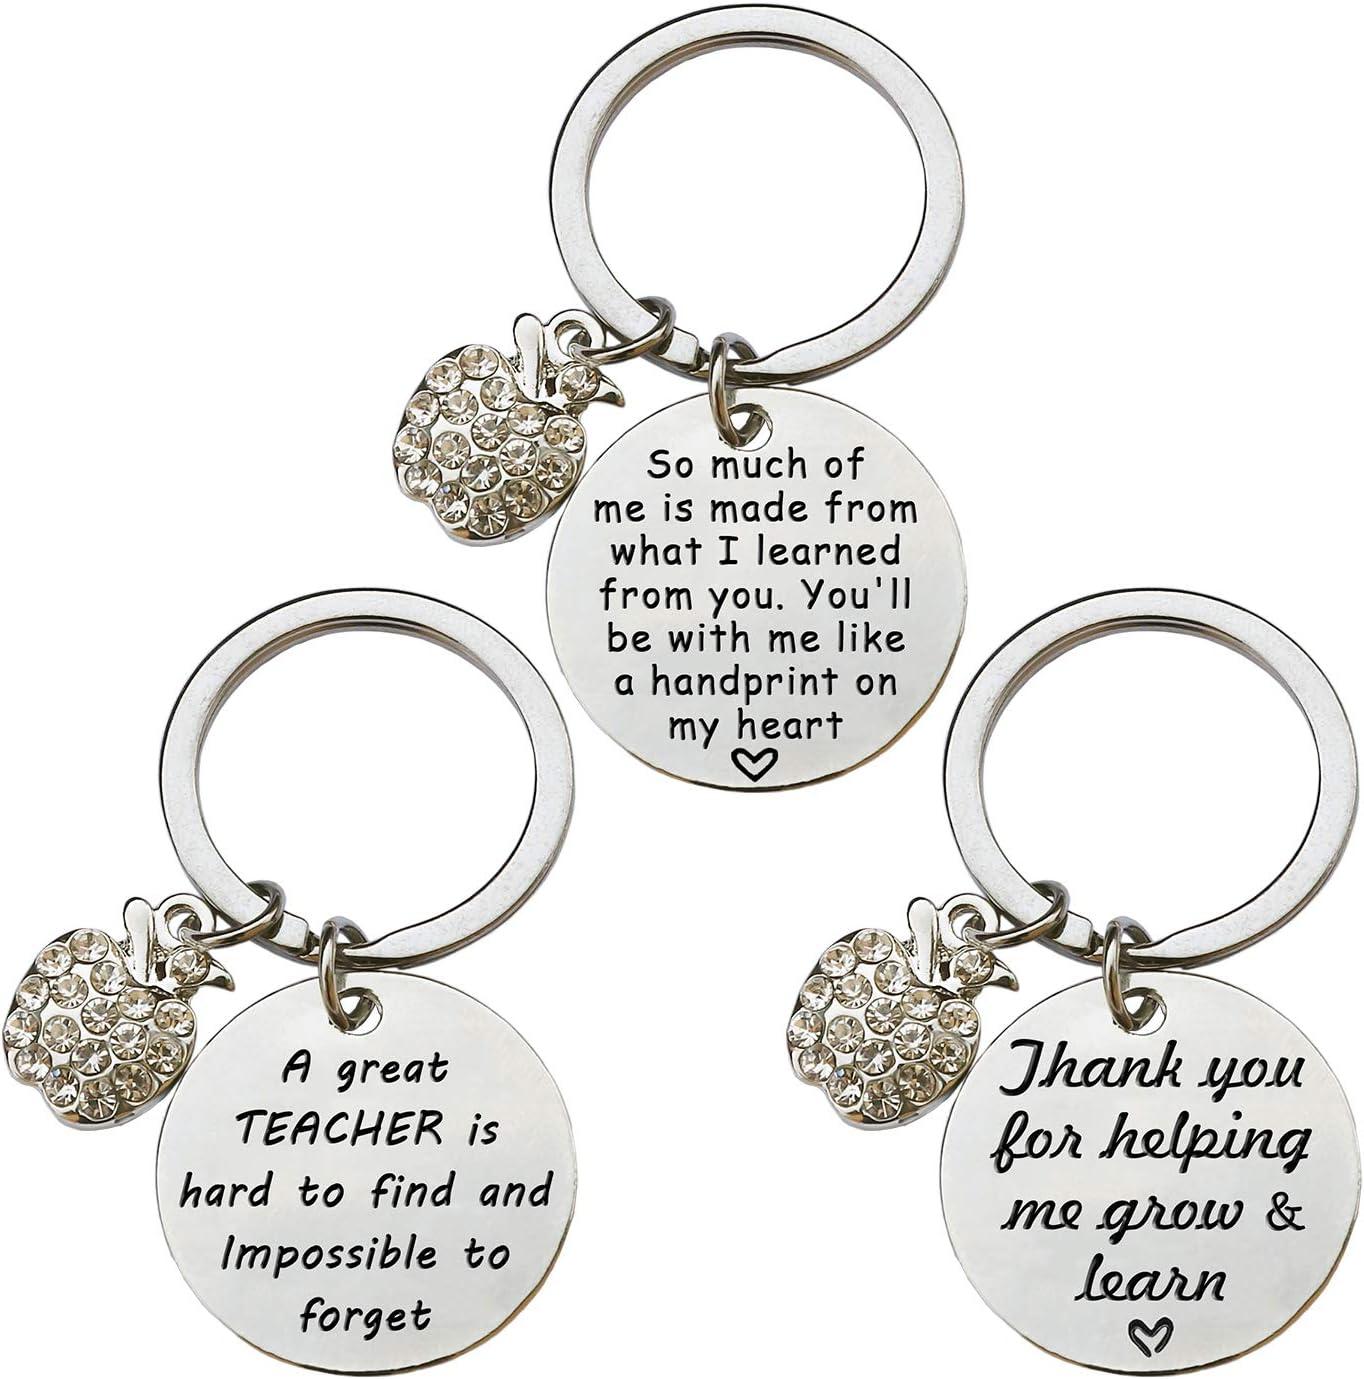 XYBAGS 3 Piece Teacher Appreciation Gifts for Women, Teacher Keychain Jewelry Gift, Graduation Gifts for Teachers Women (Style B)